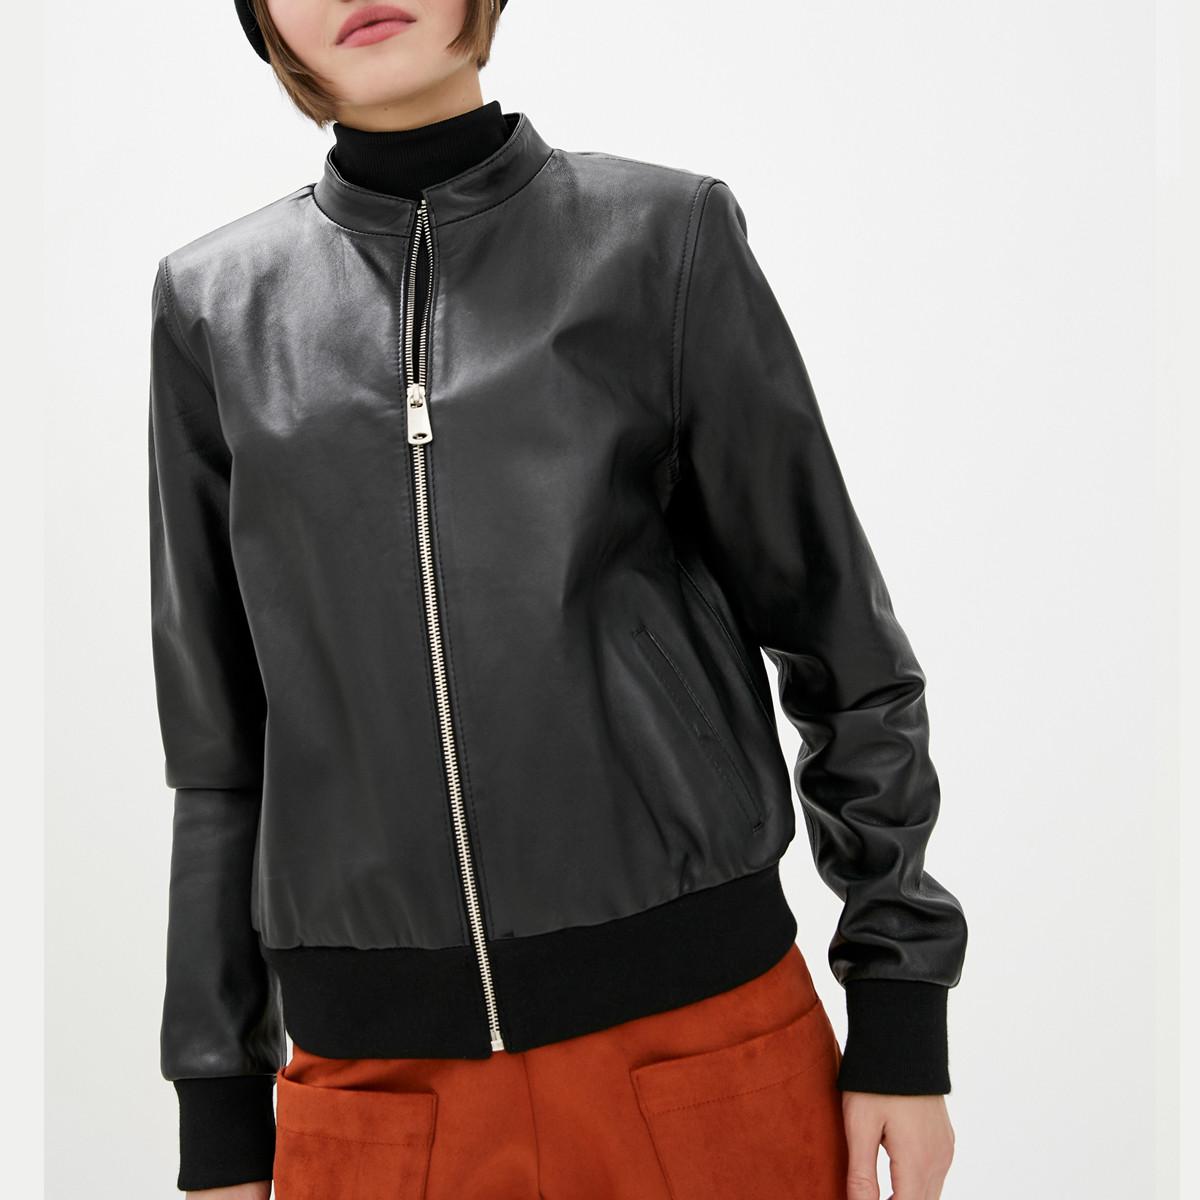 Шкіряна куртка-бомбер VK чорна (Арт. BM201)